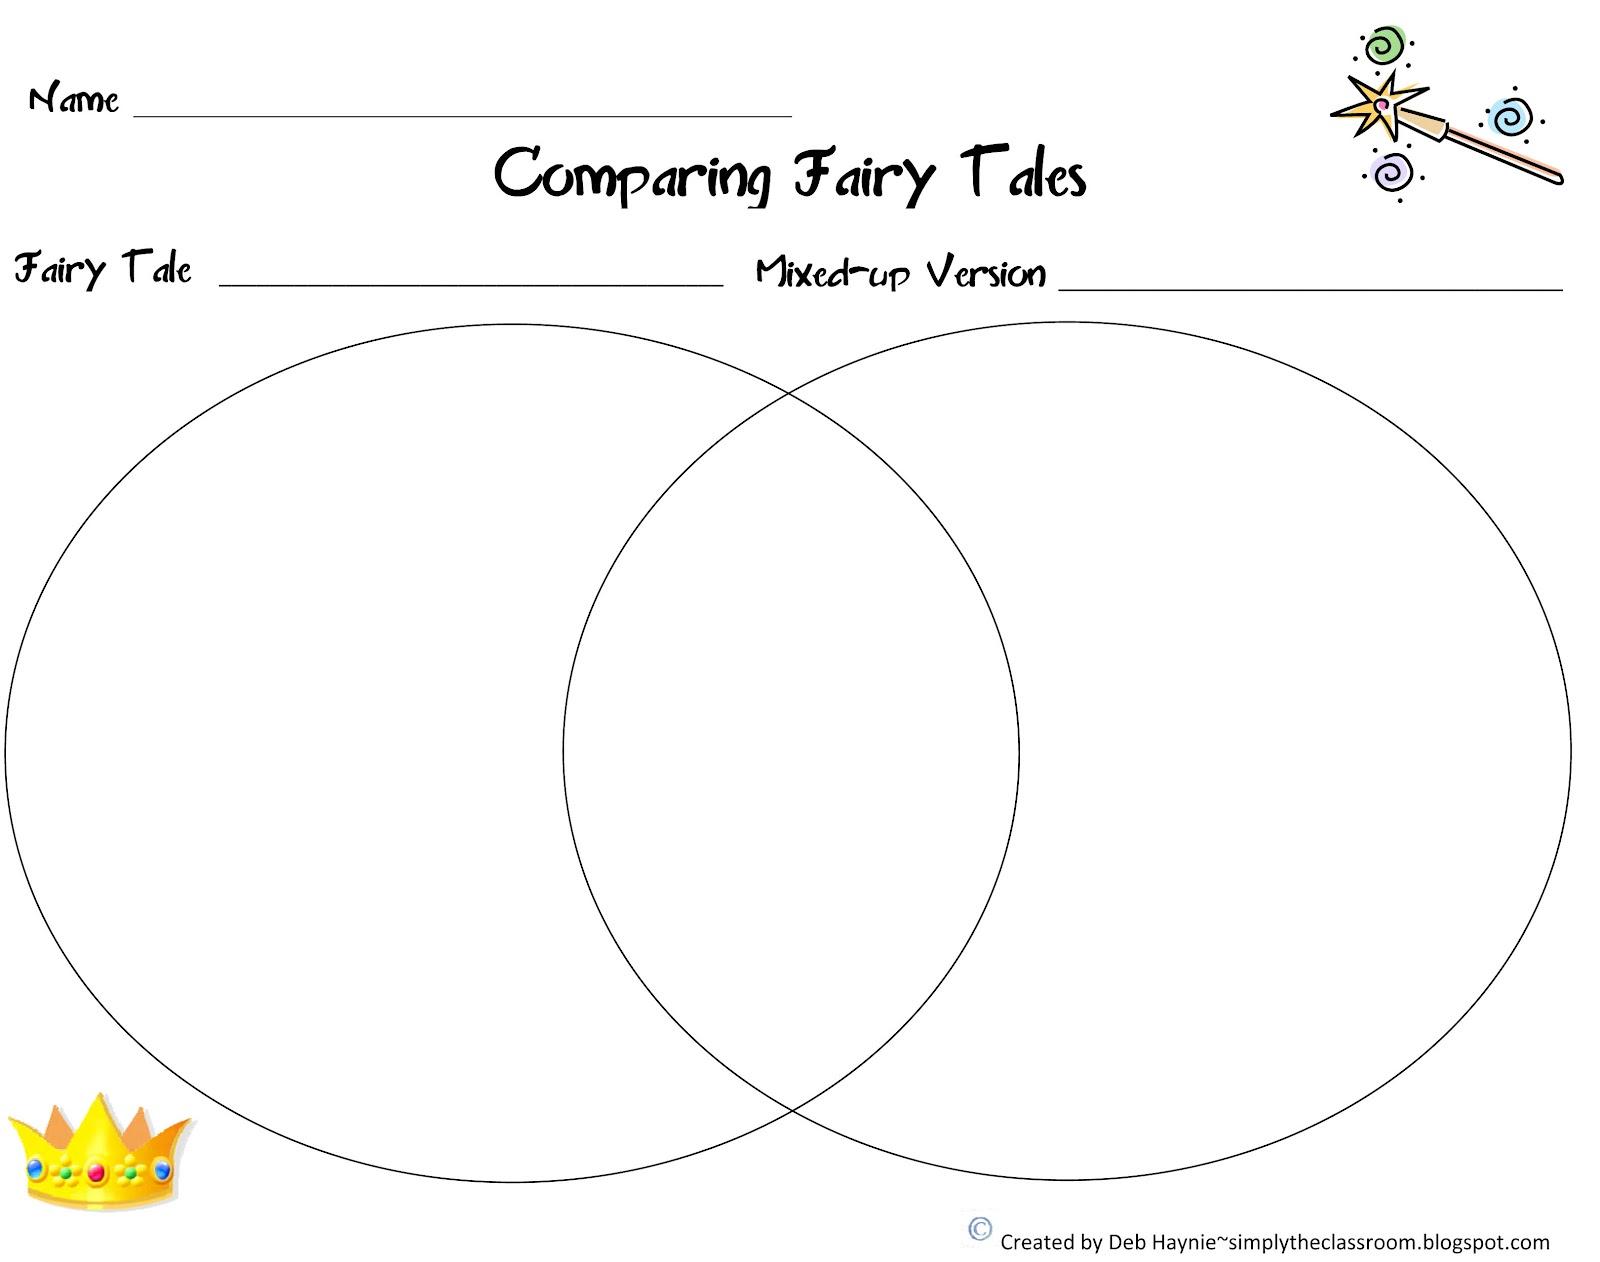 cinderella venn diagram compare contrast calibre water temp gauge wiring fairy tales are like the ocean